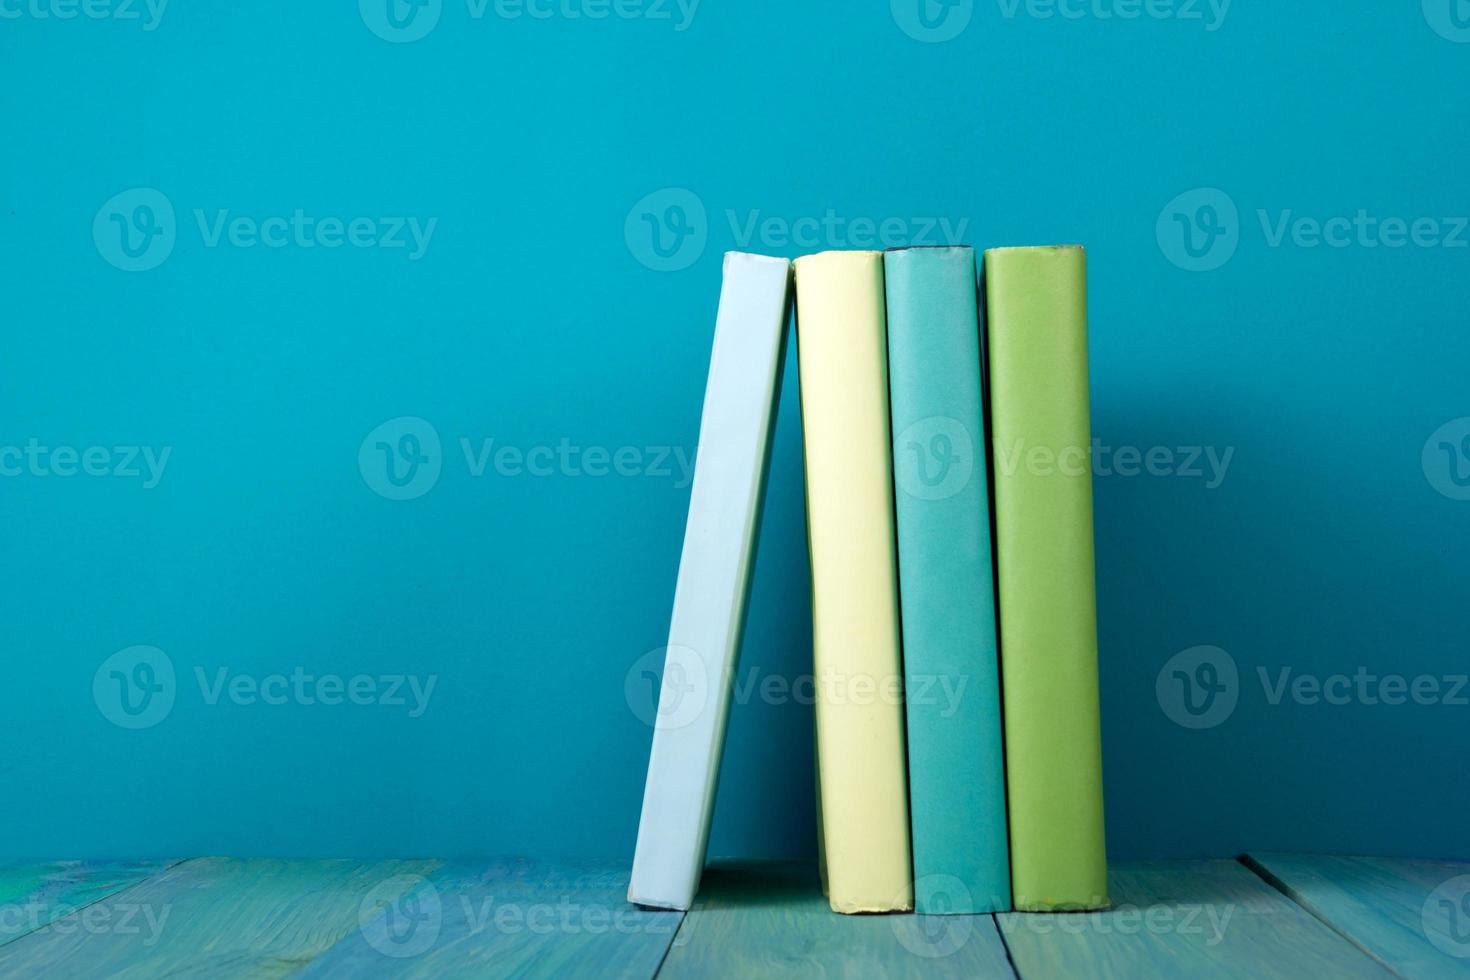 fila de libros, fondo azul sucio, espacio de copia libre foto